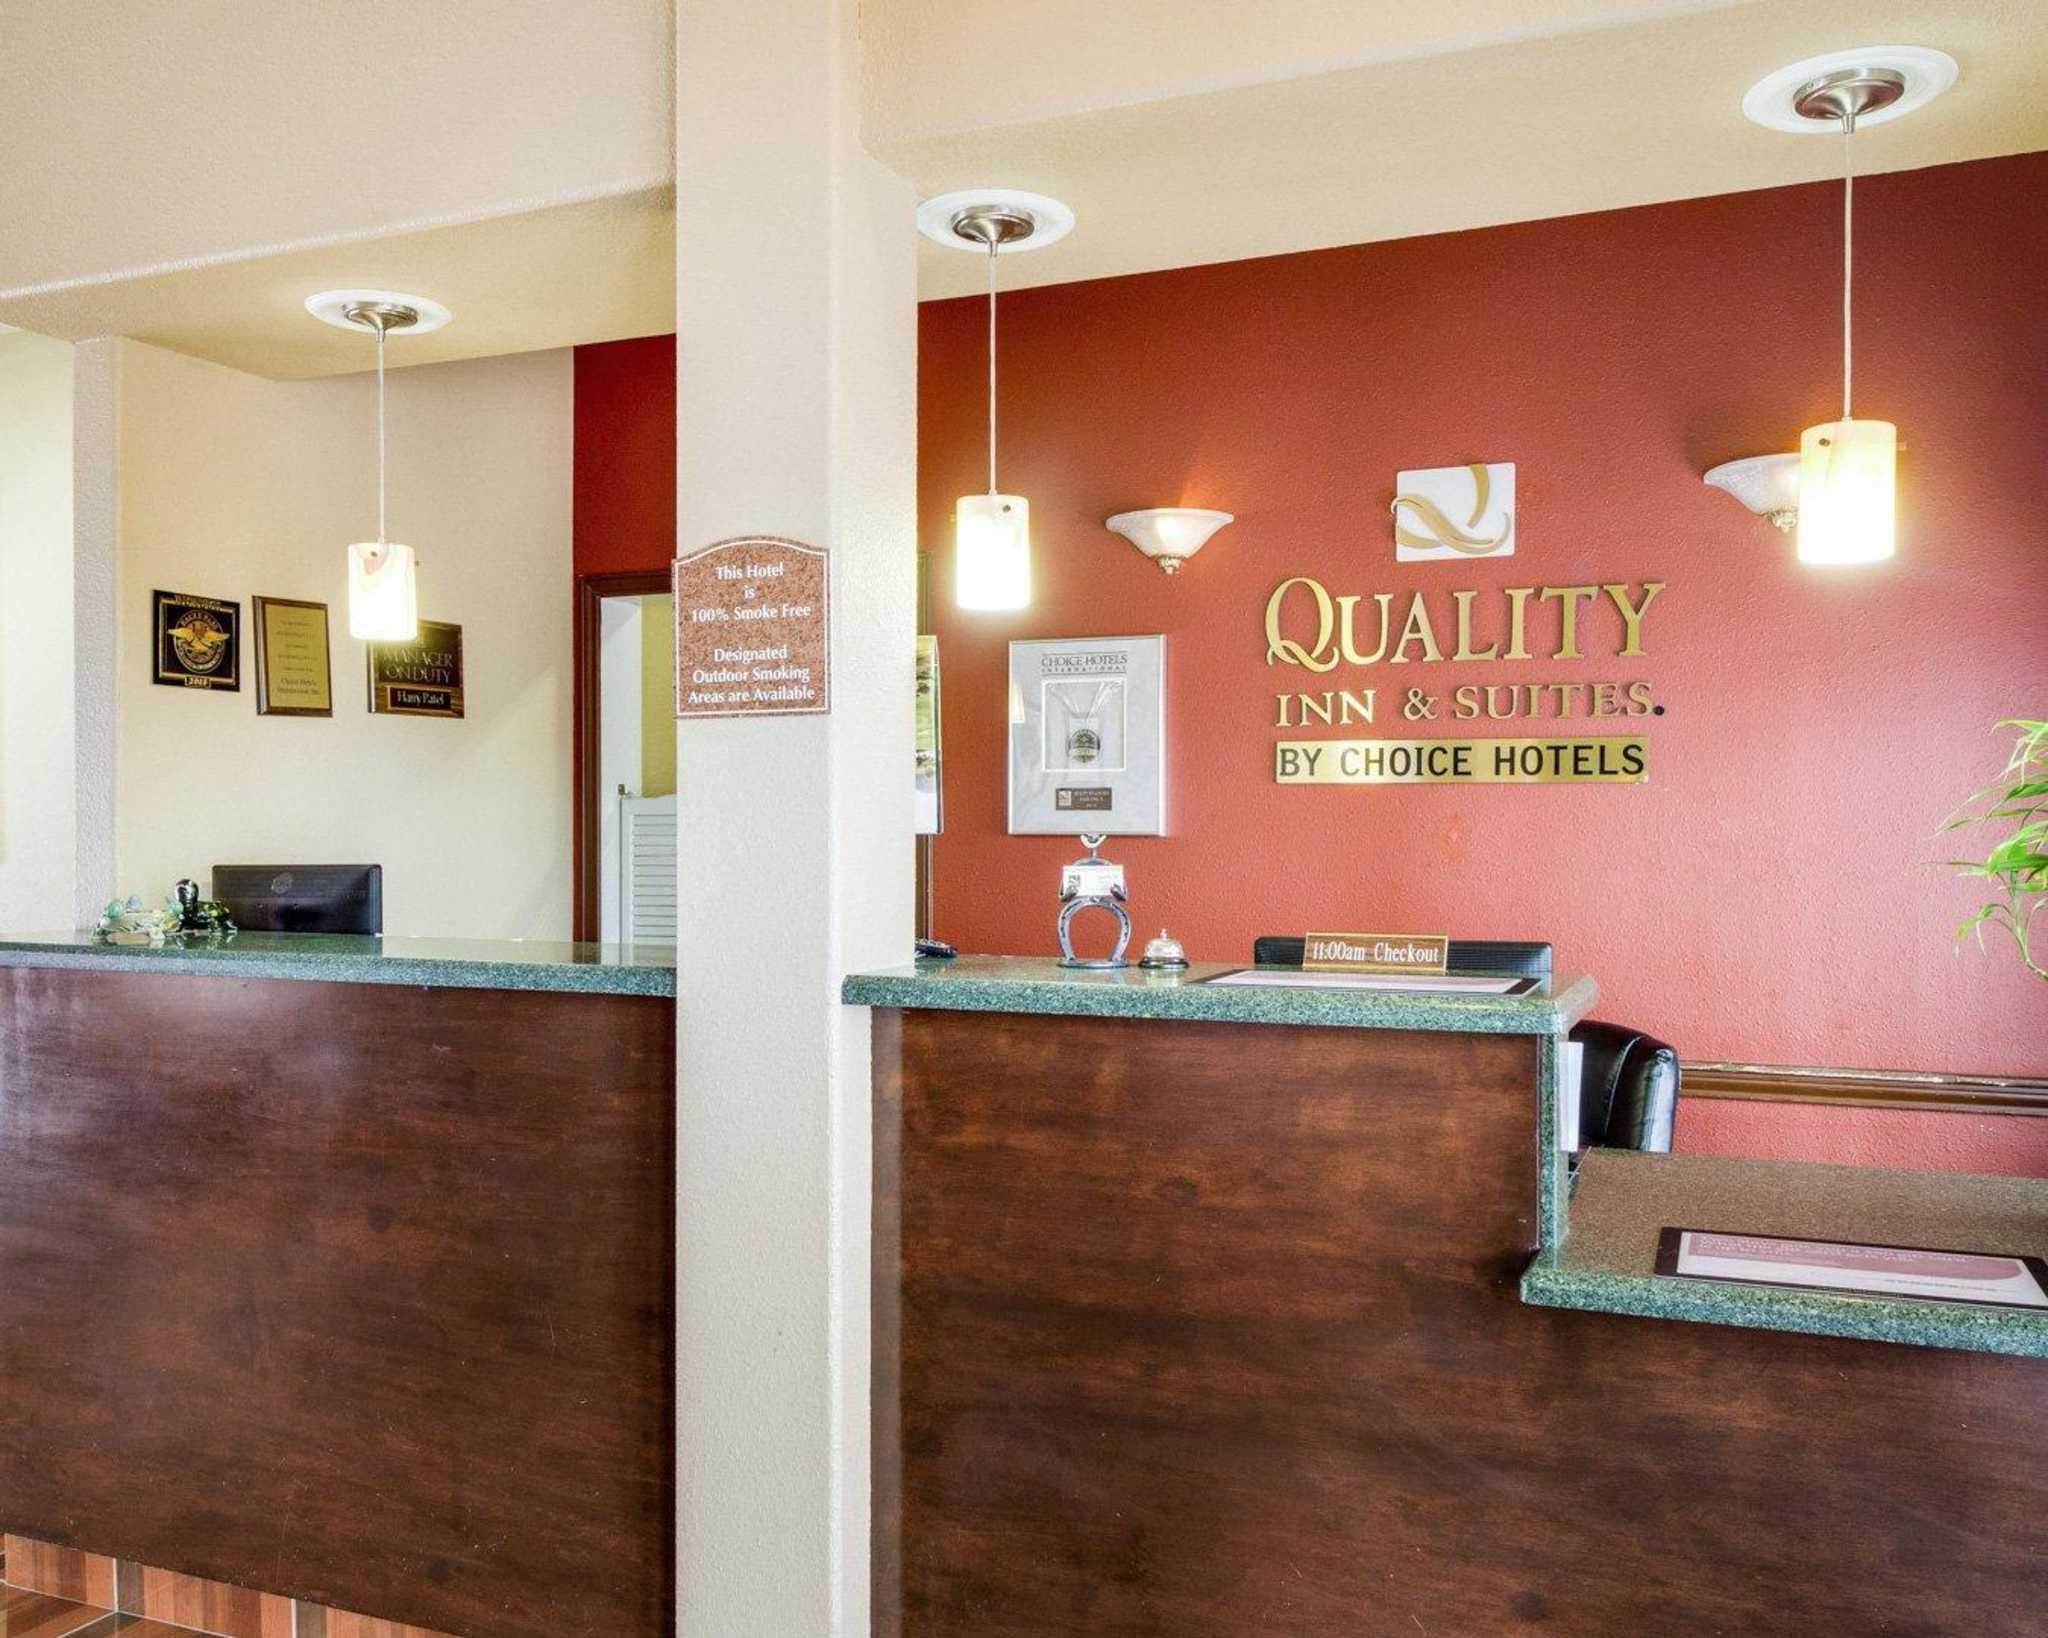 Quality Inn & Suites Eagle Pass image 11